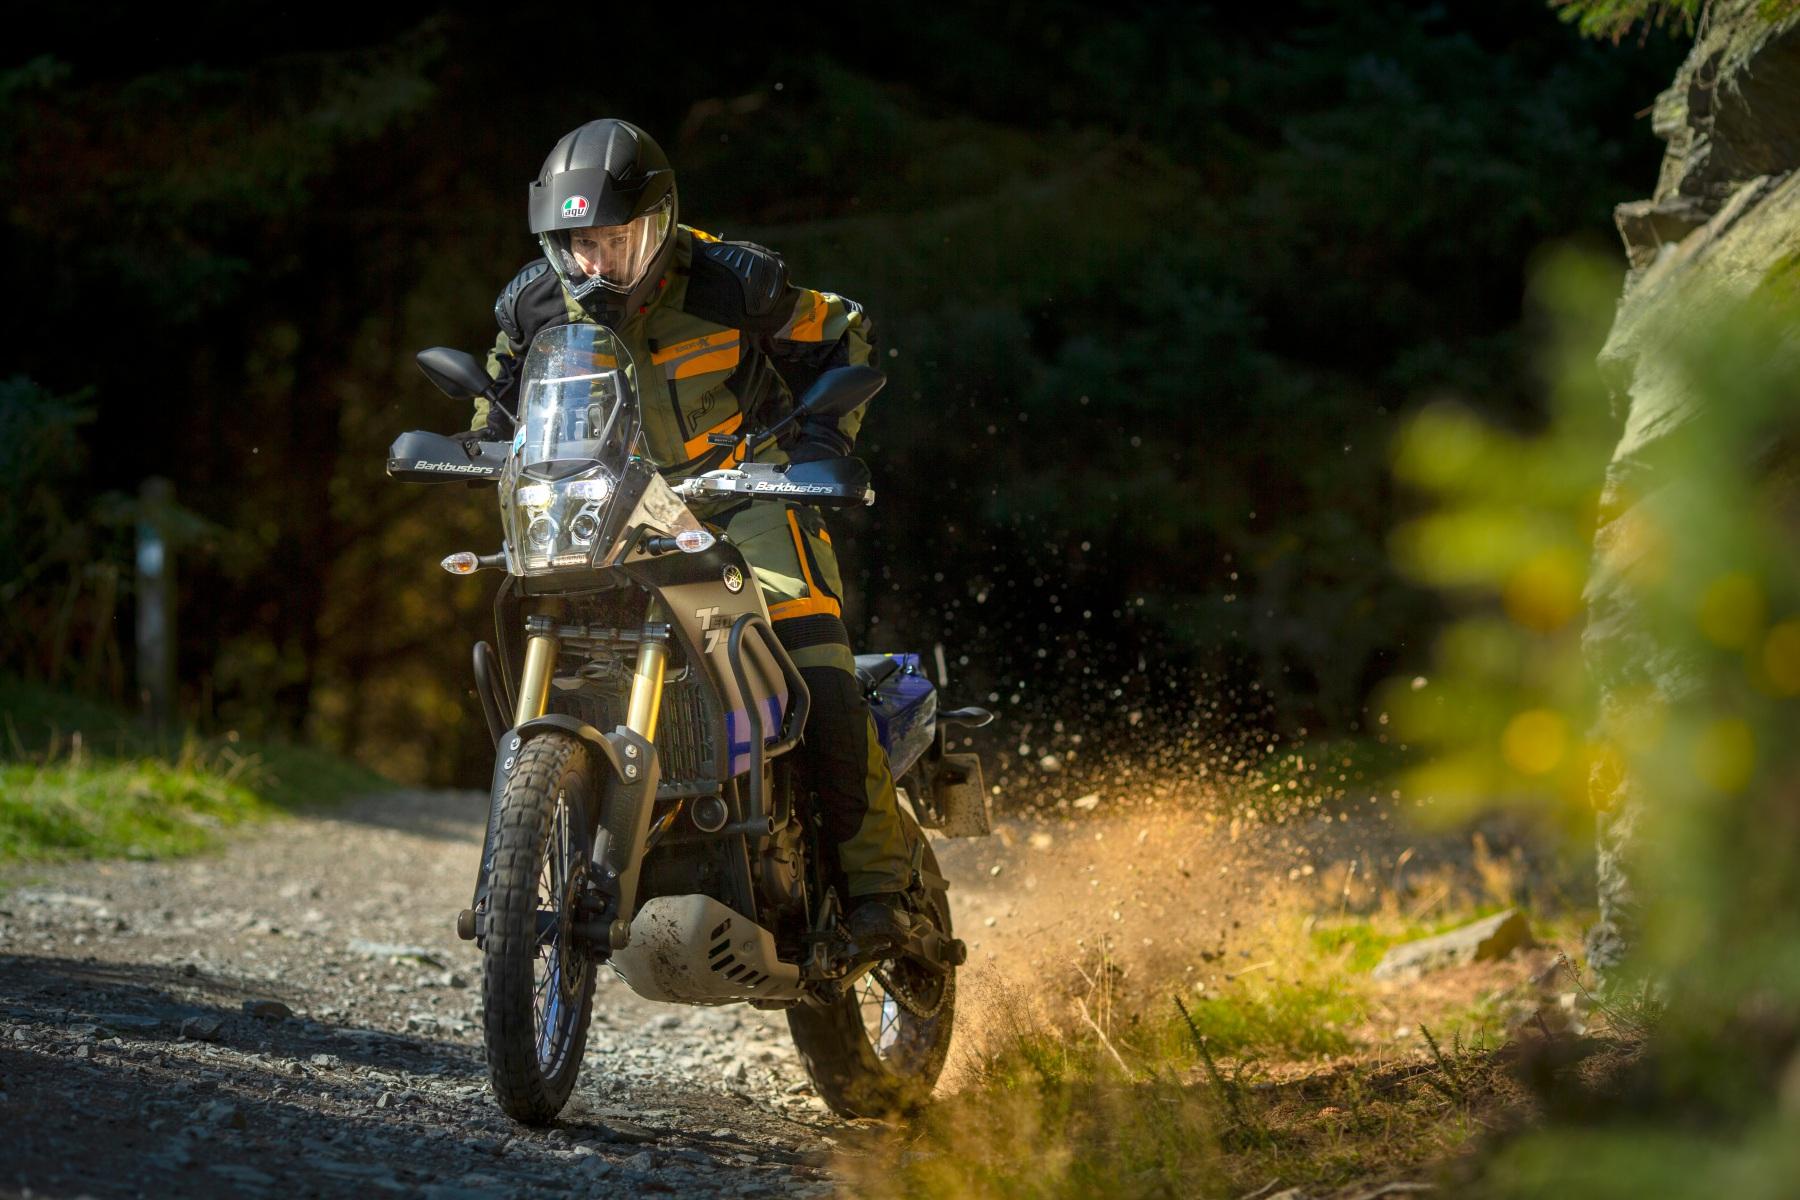 102409-rst-pro-series-adventure-x-jacket-green-lifestyle-01